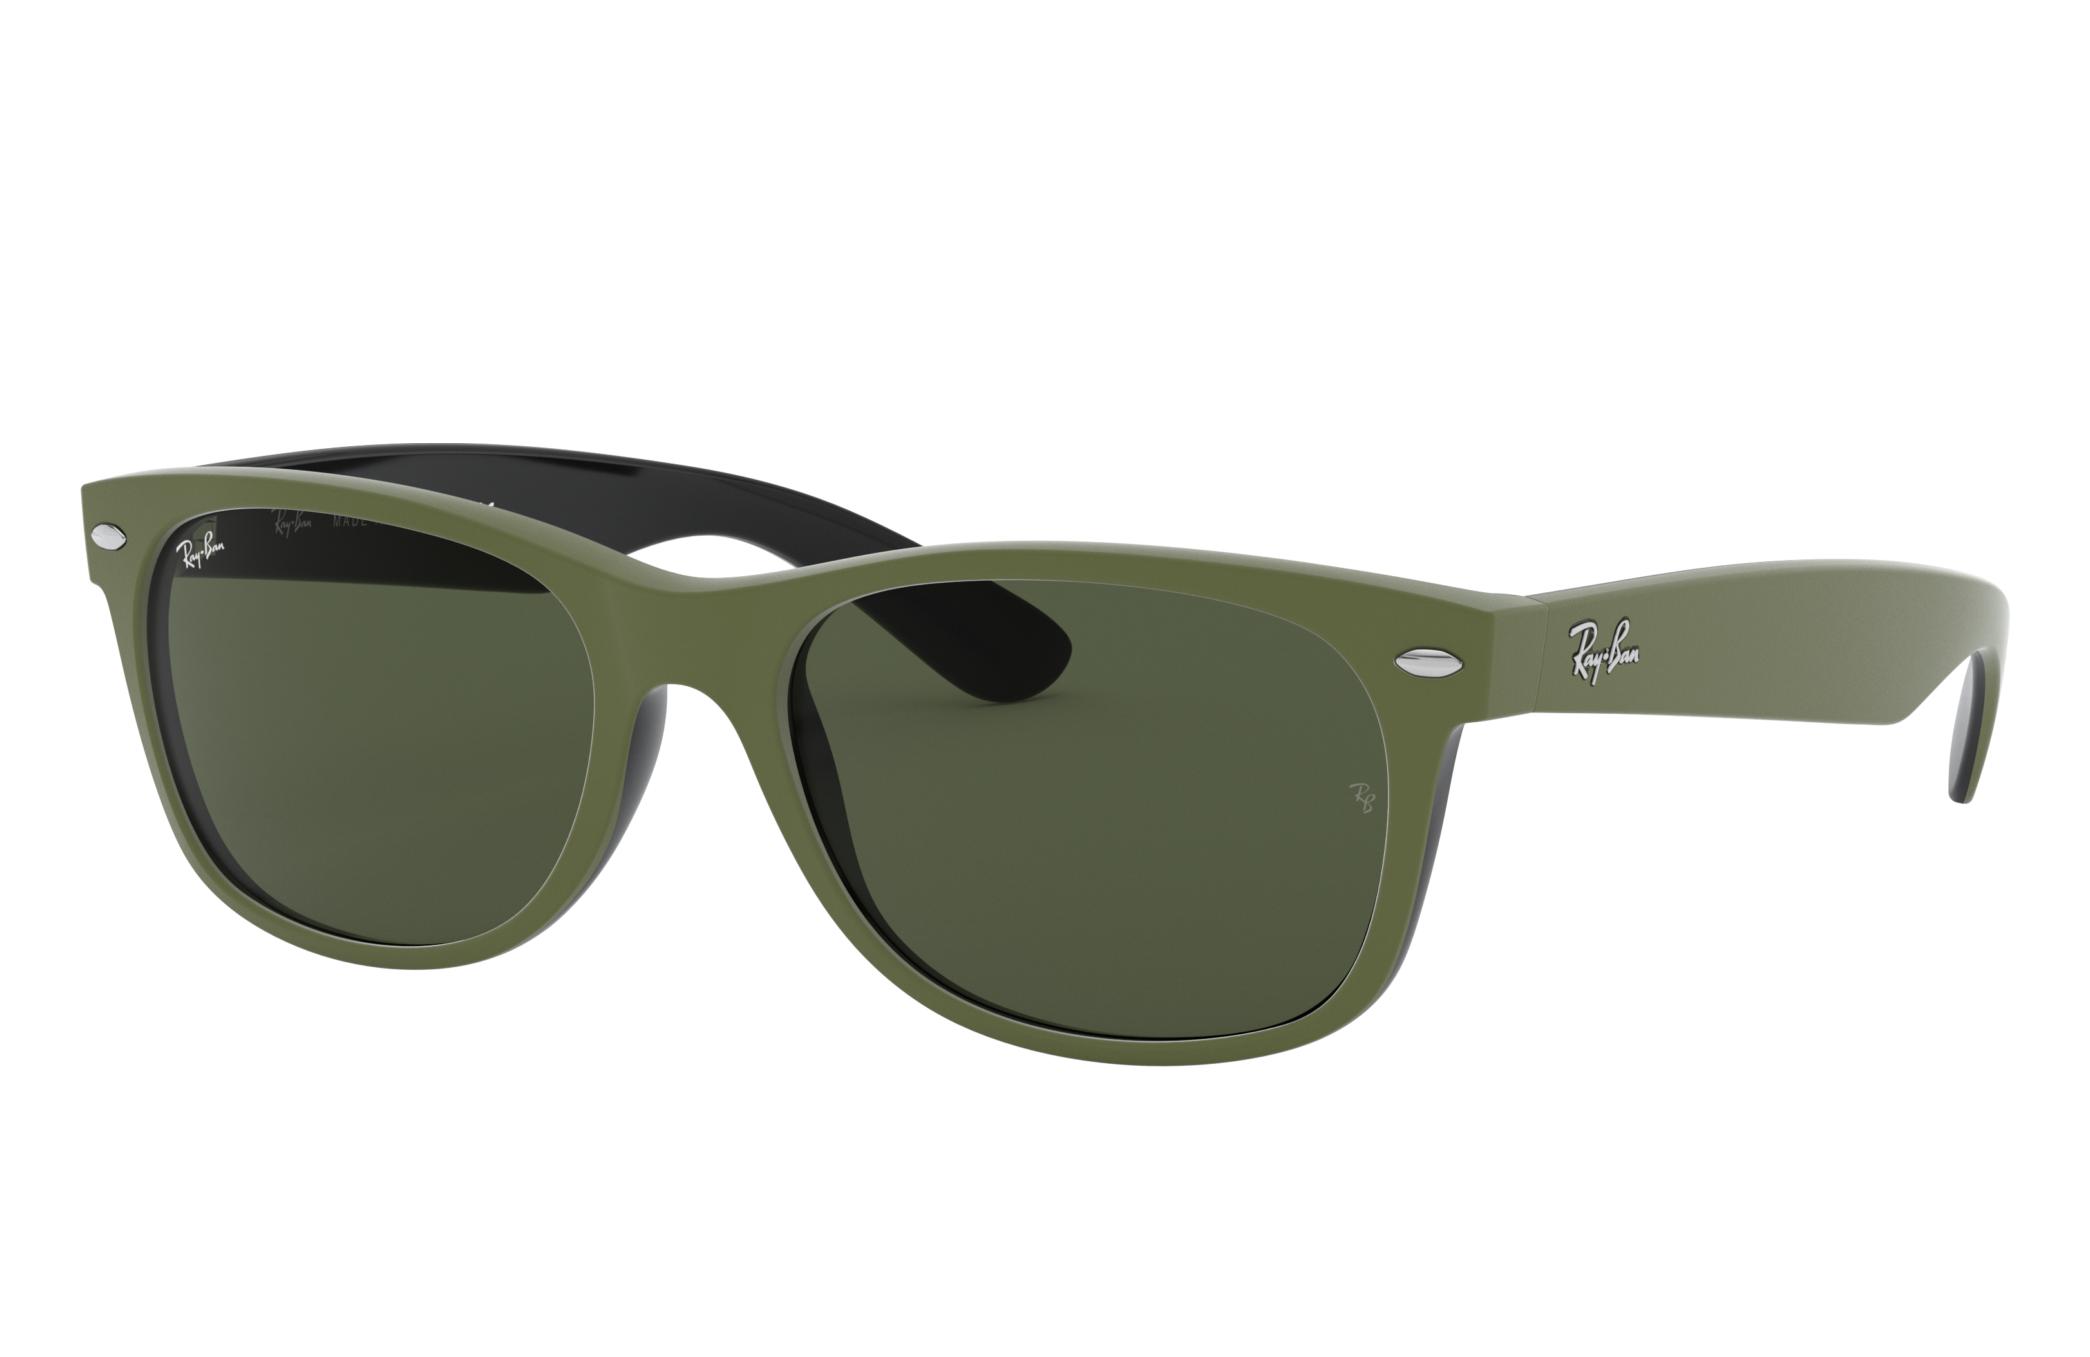 Ray-Ban New Wayfarer Color Mix Green, Green Lenses - RB2132